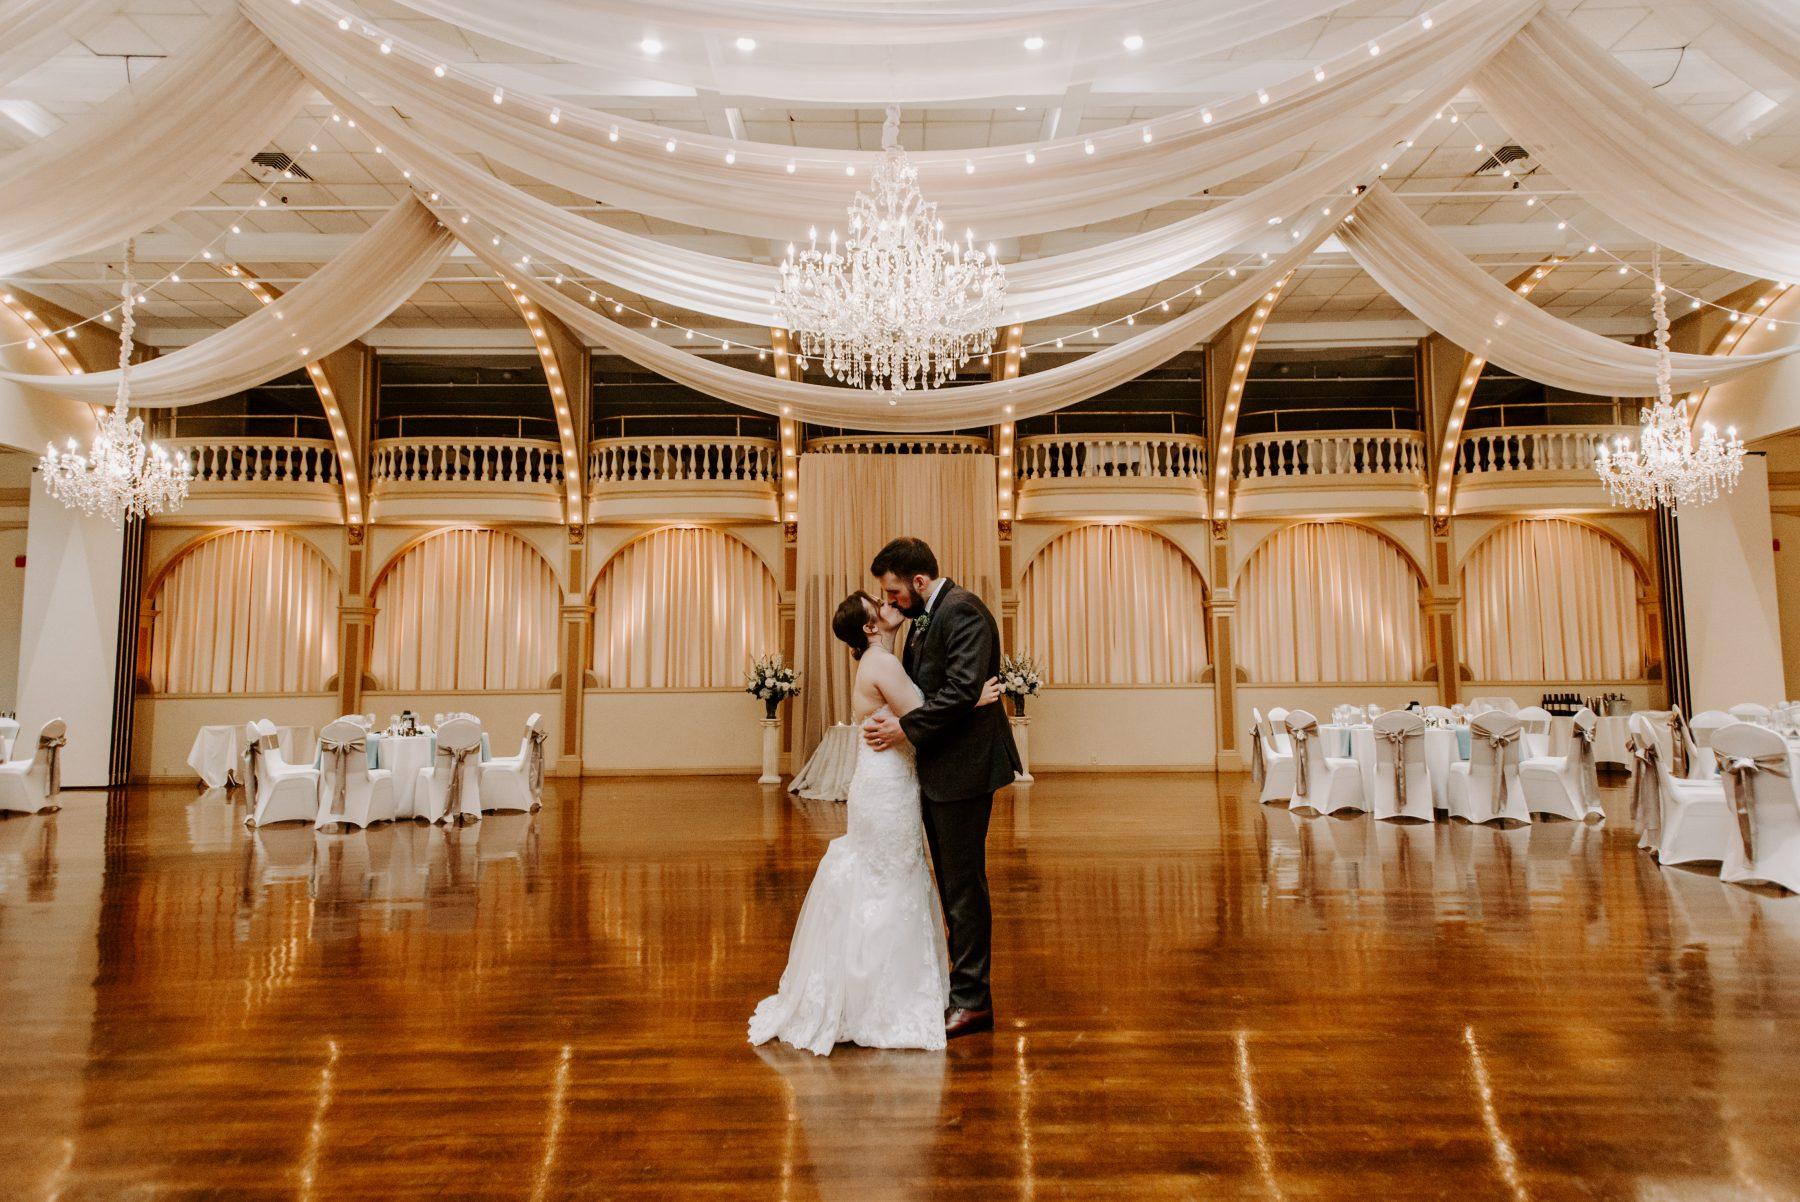 Rhodes on the Pawtuxet Cranston Wedding Ashley and David Blueflash Photography 22